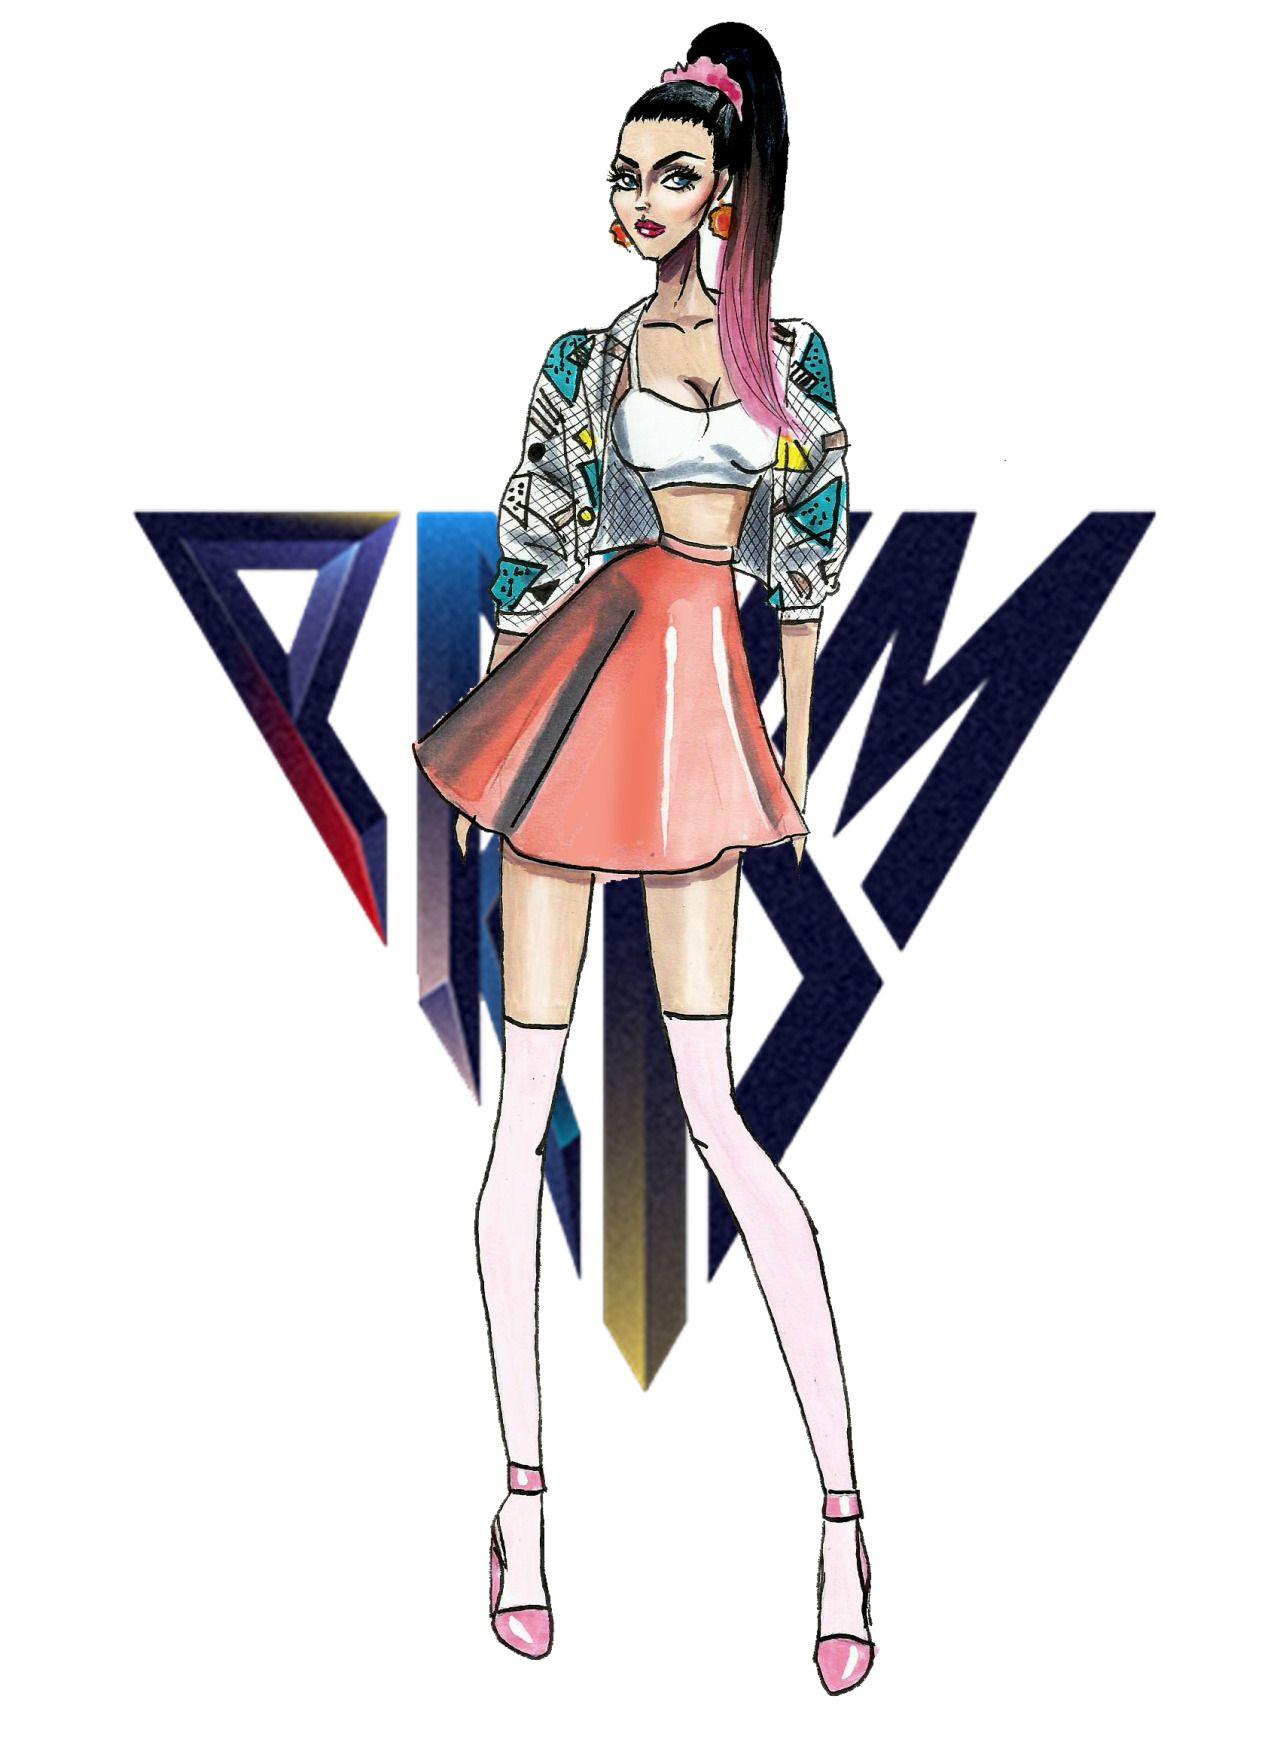 The Katy Perry Eras - Prism - by Armand Mehidri | Dibujos ...